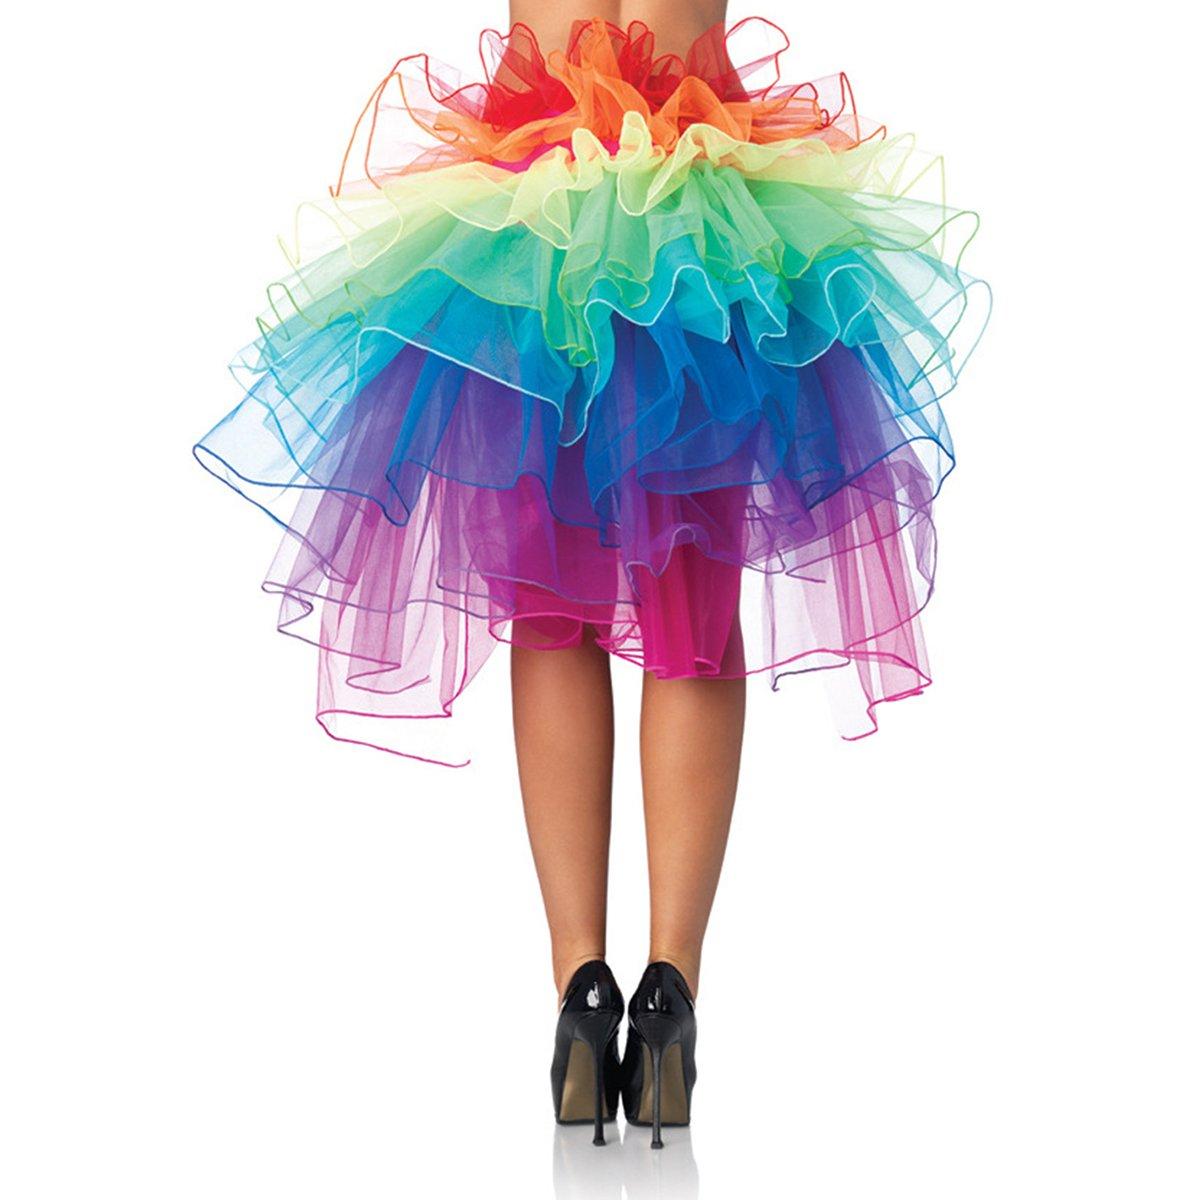 PIXNOR Womens Fantasy Layered Dancing Tutu Rainbow Bustle Skirt